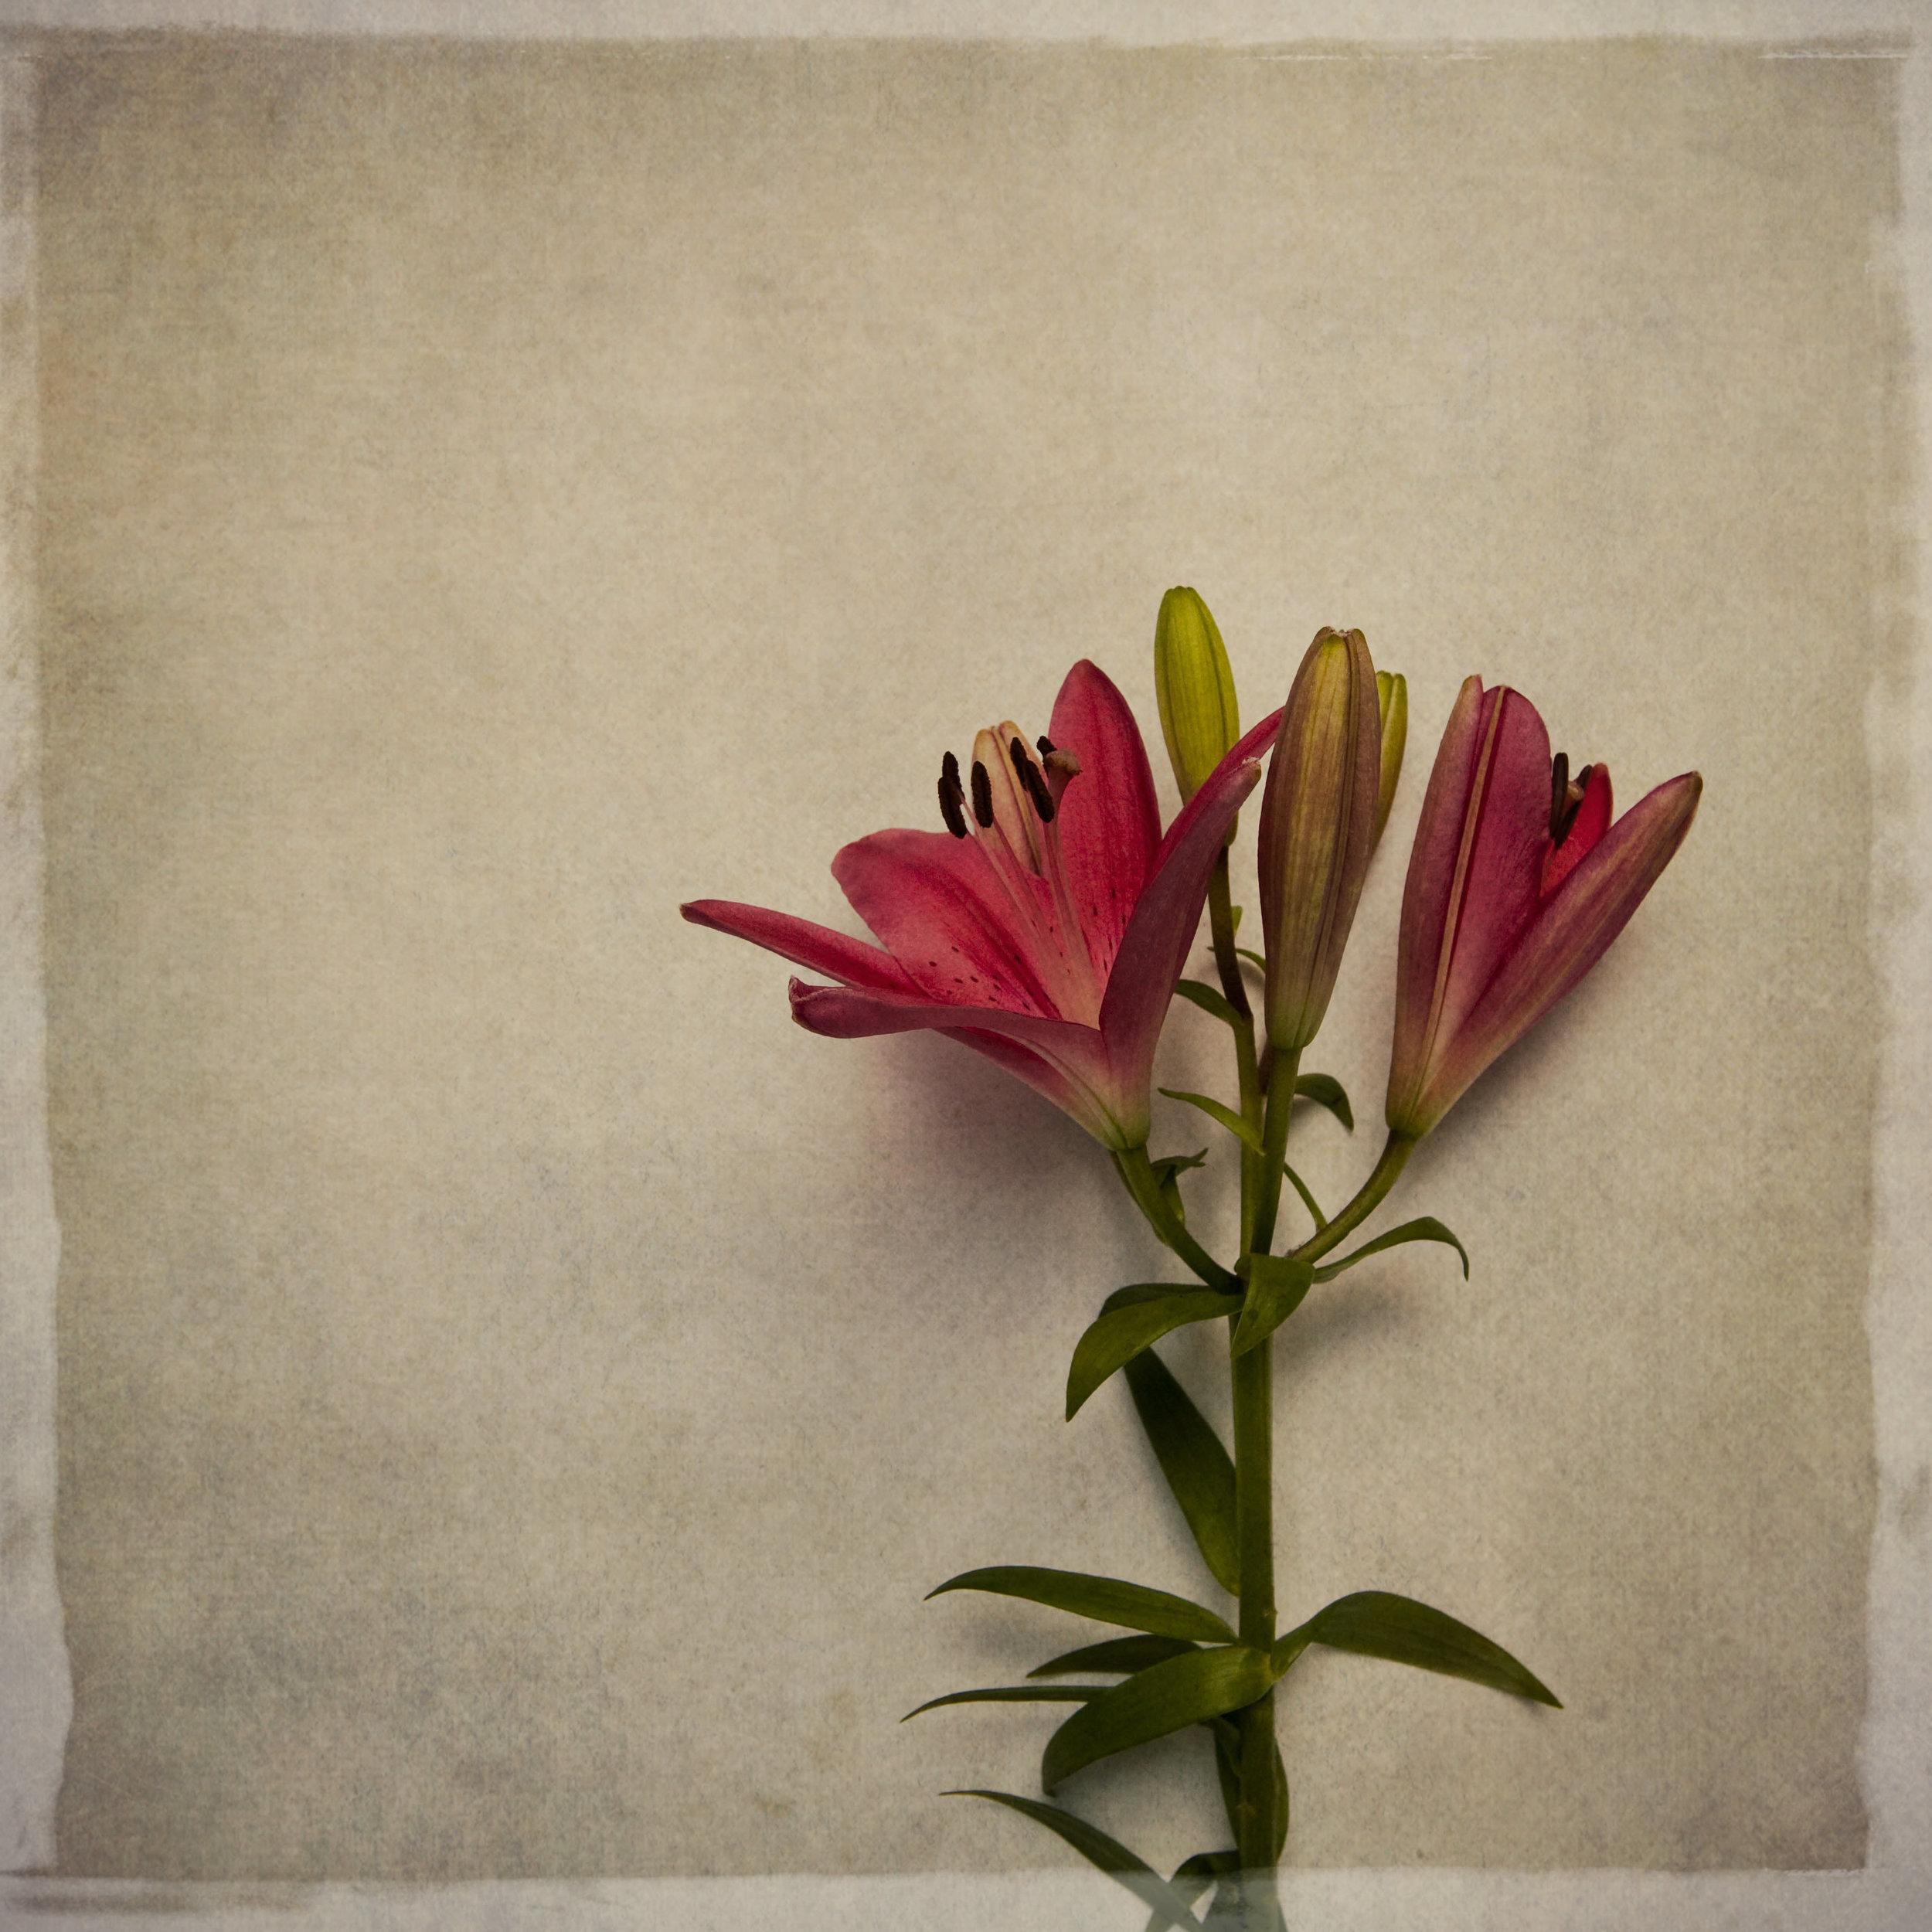 lily-7752.jpg